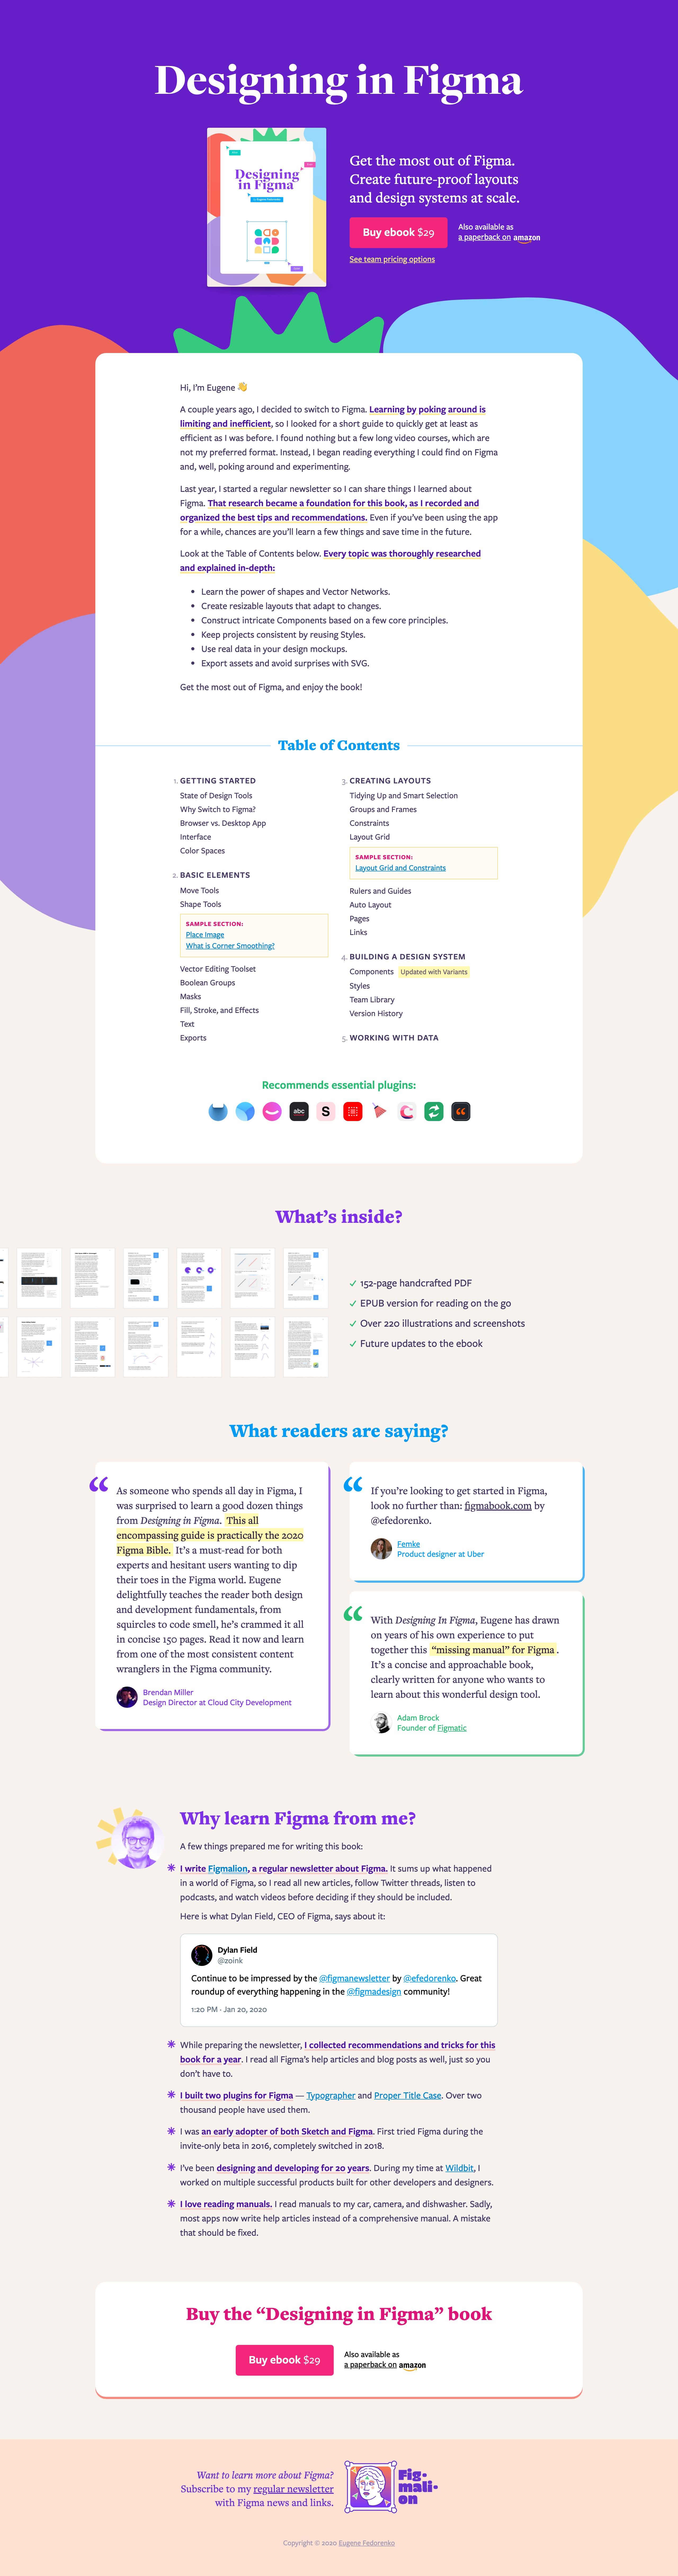 'Designing in Figma' Book Website Screenshot